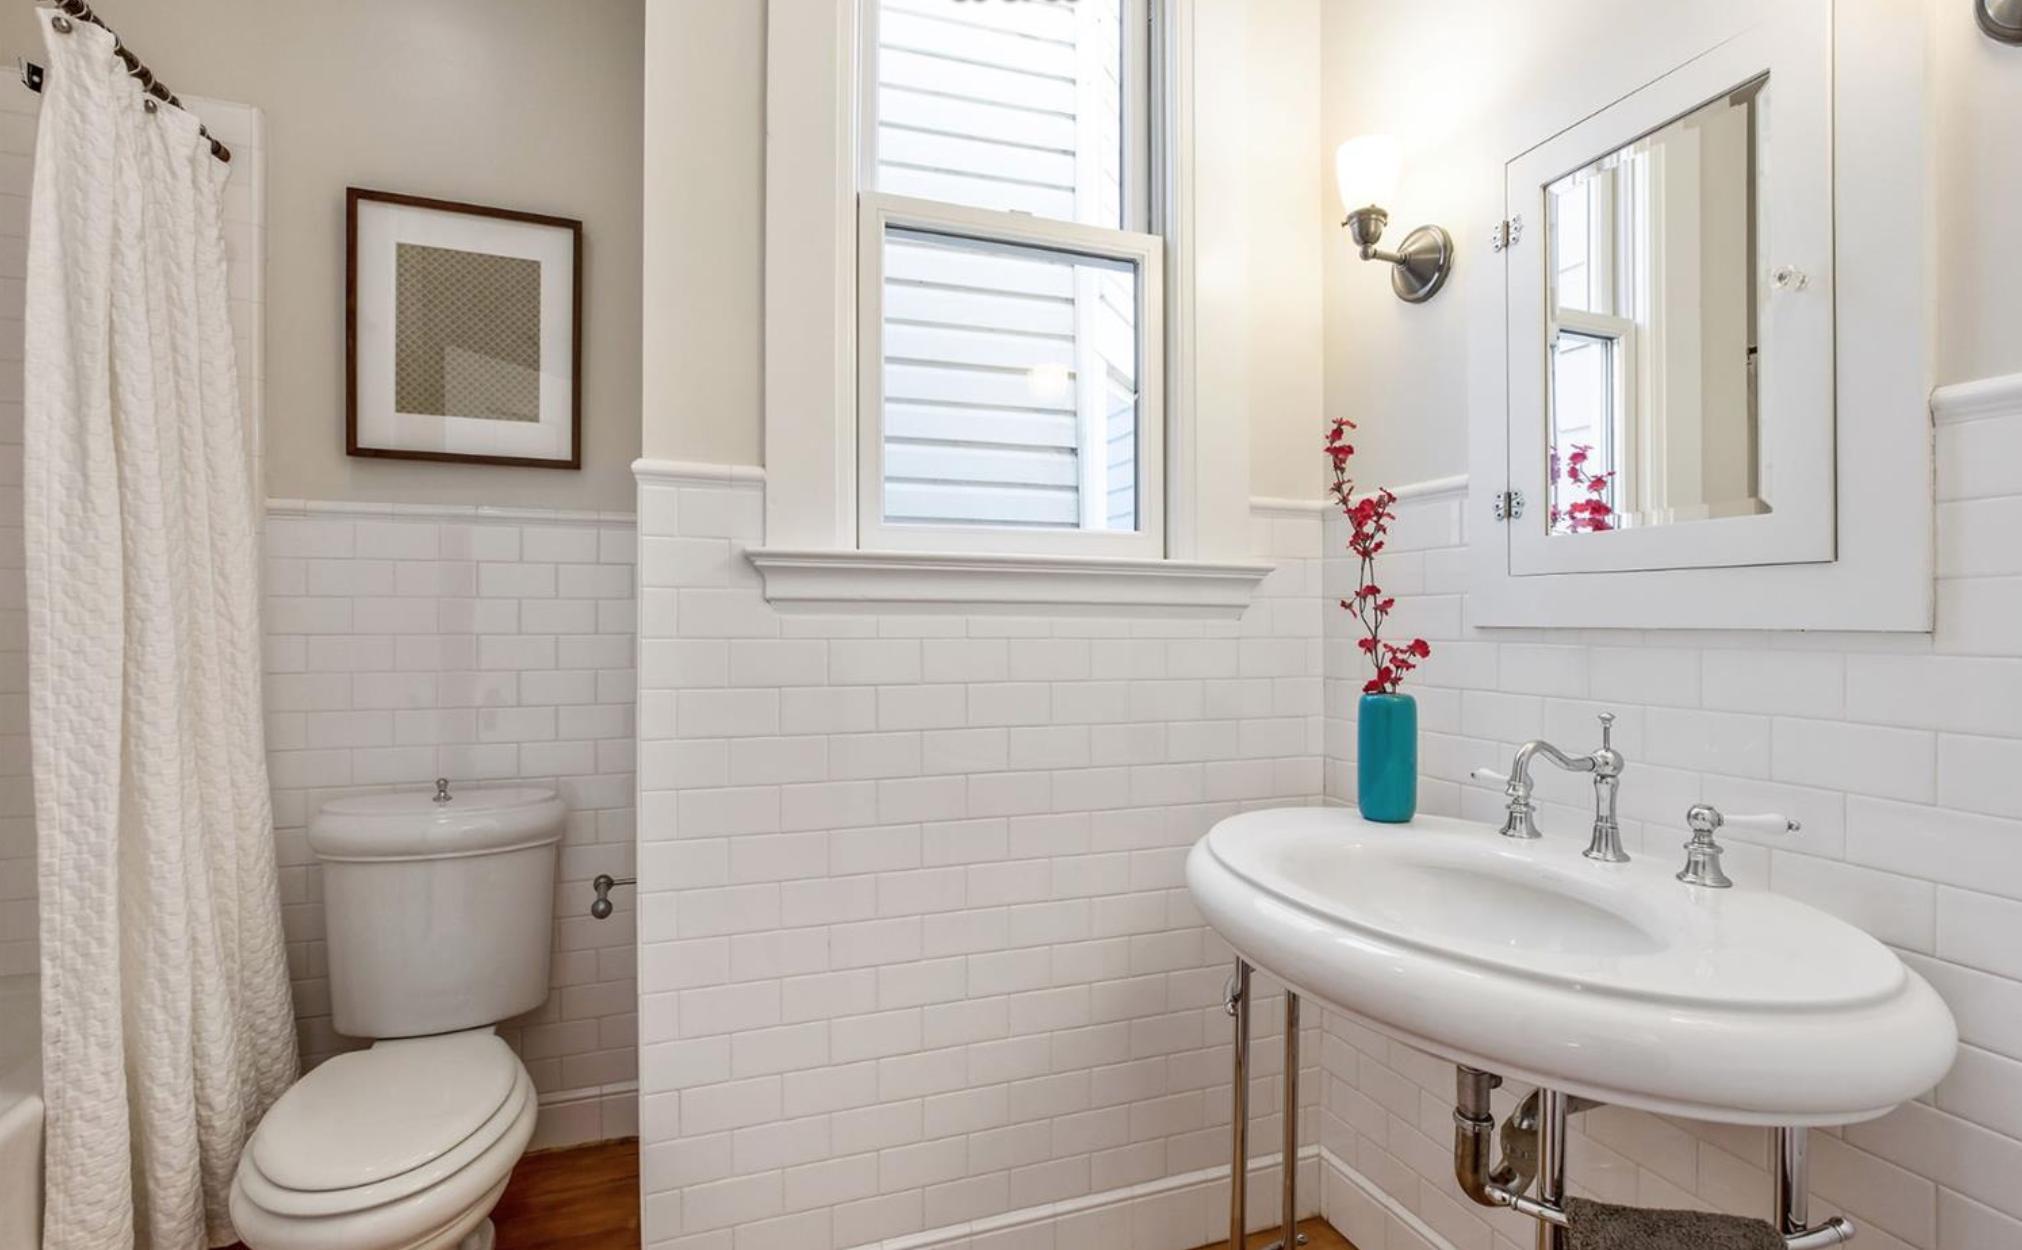 125 Downey St - Bathroom